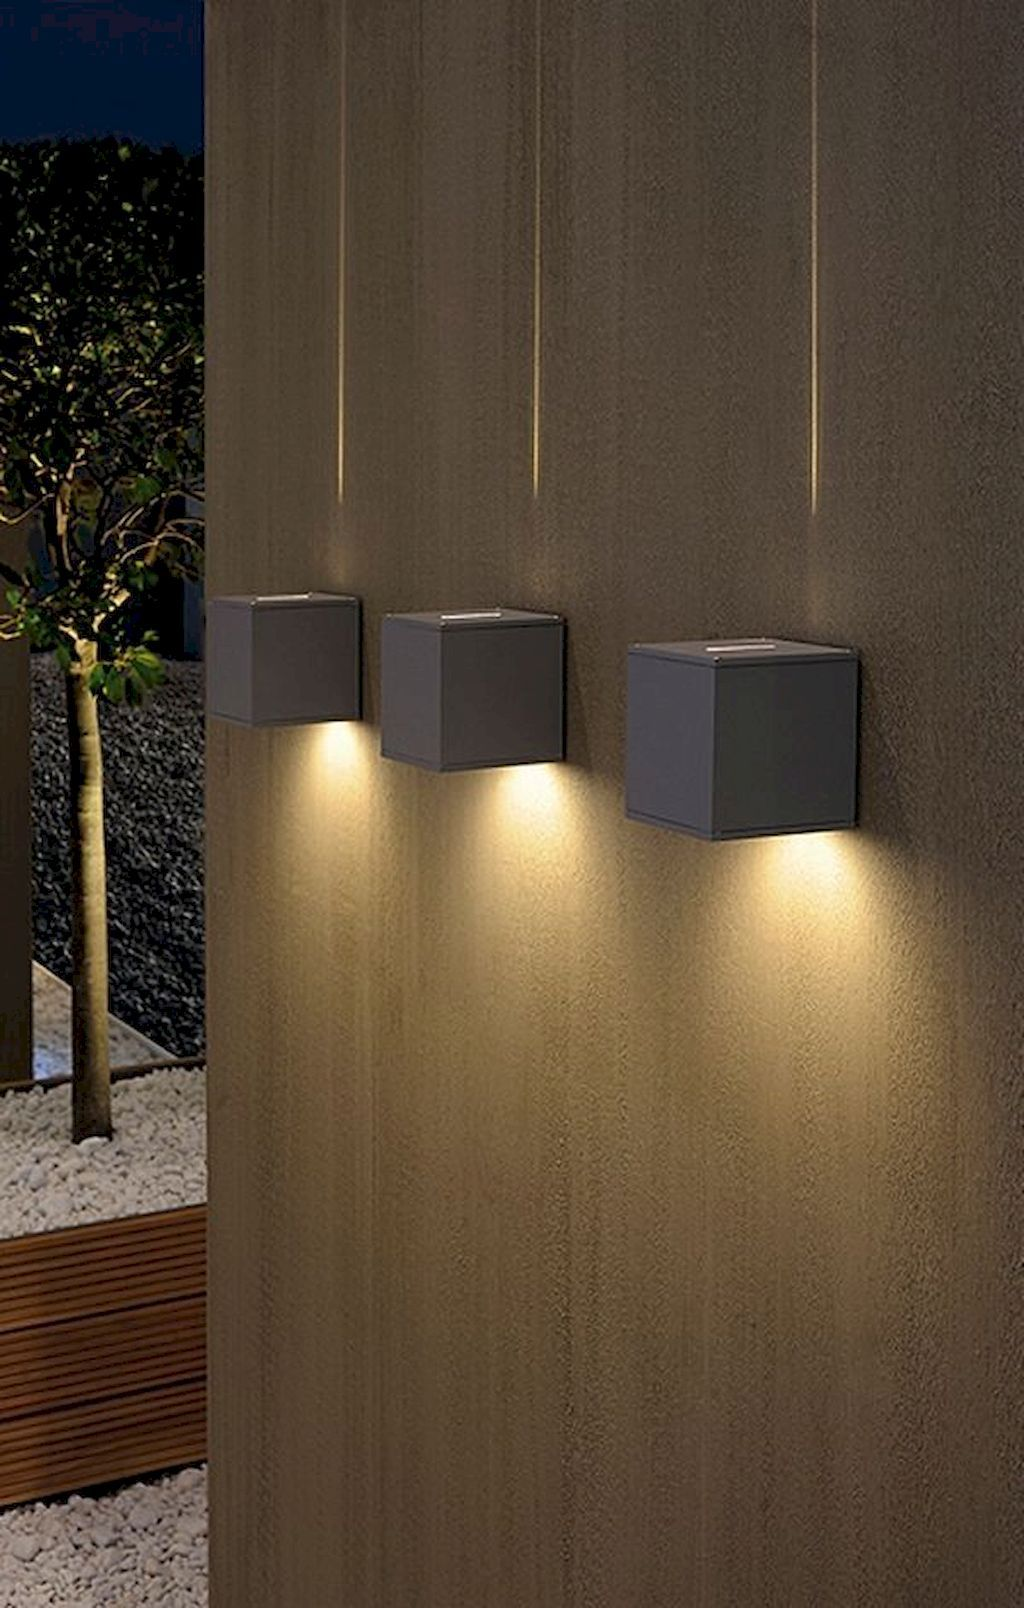 Patio Lighting Ideas Jihanshanum Wall Lighting Design Diy Outdoor Lighting Backyard Lighting Diy